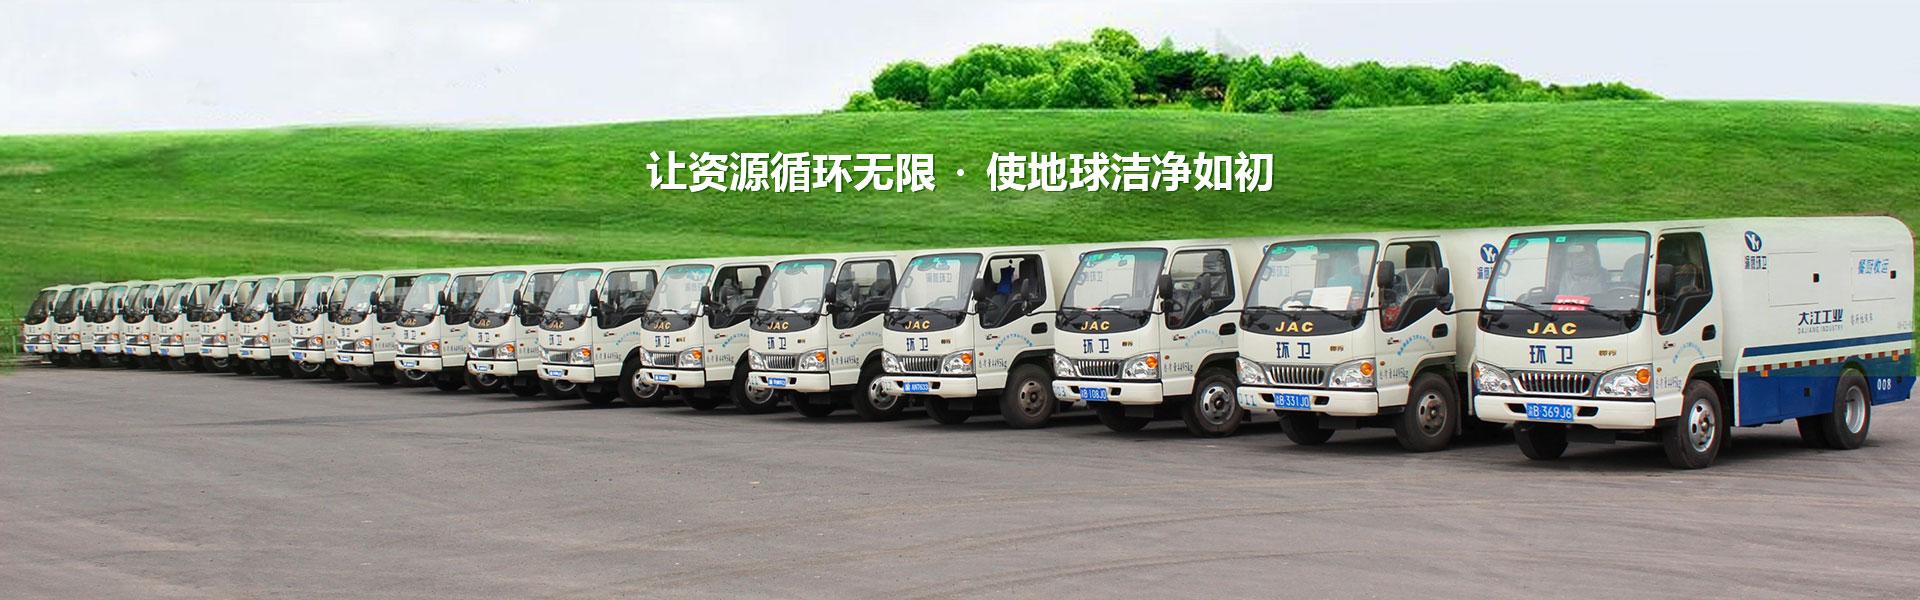 重庆废油回收